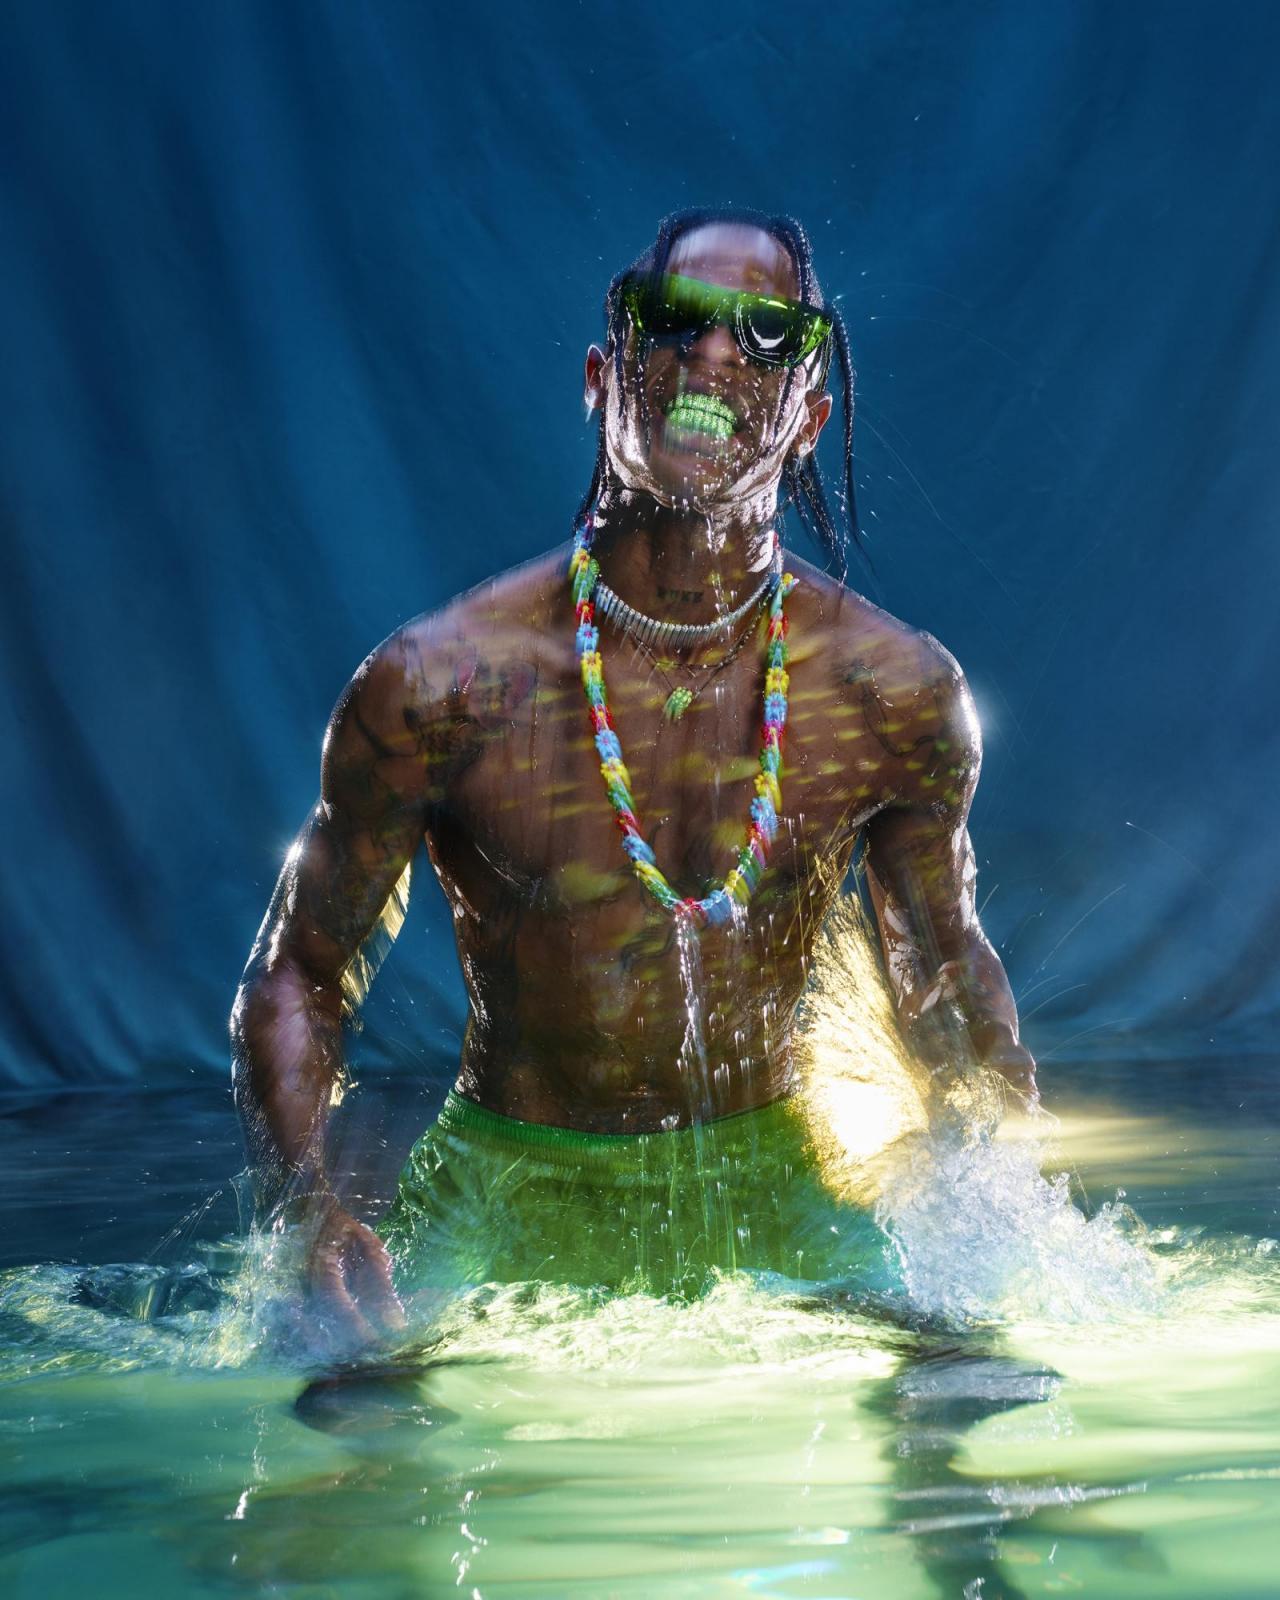 Travis Scott photographed by David LaChapelle forBottega Veneta Issue 02.